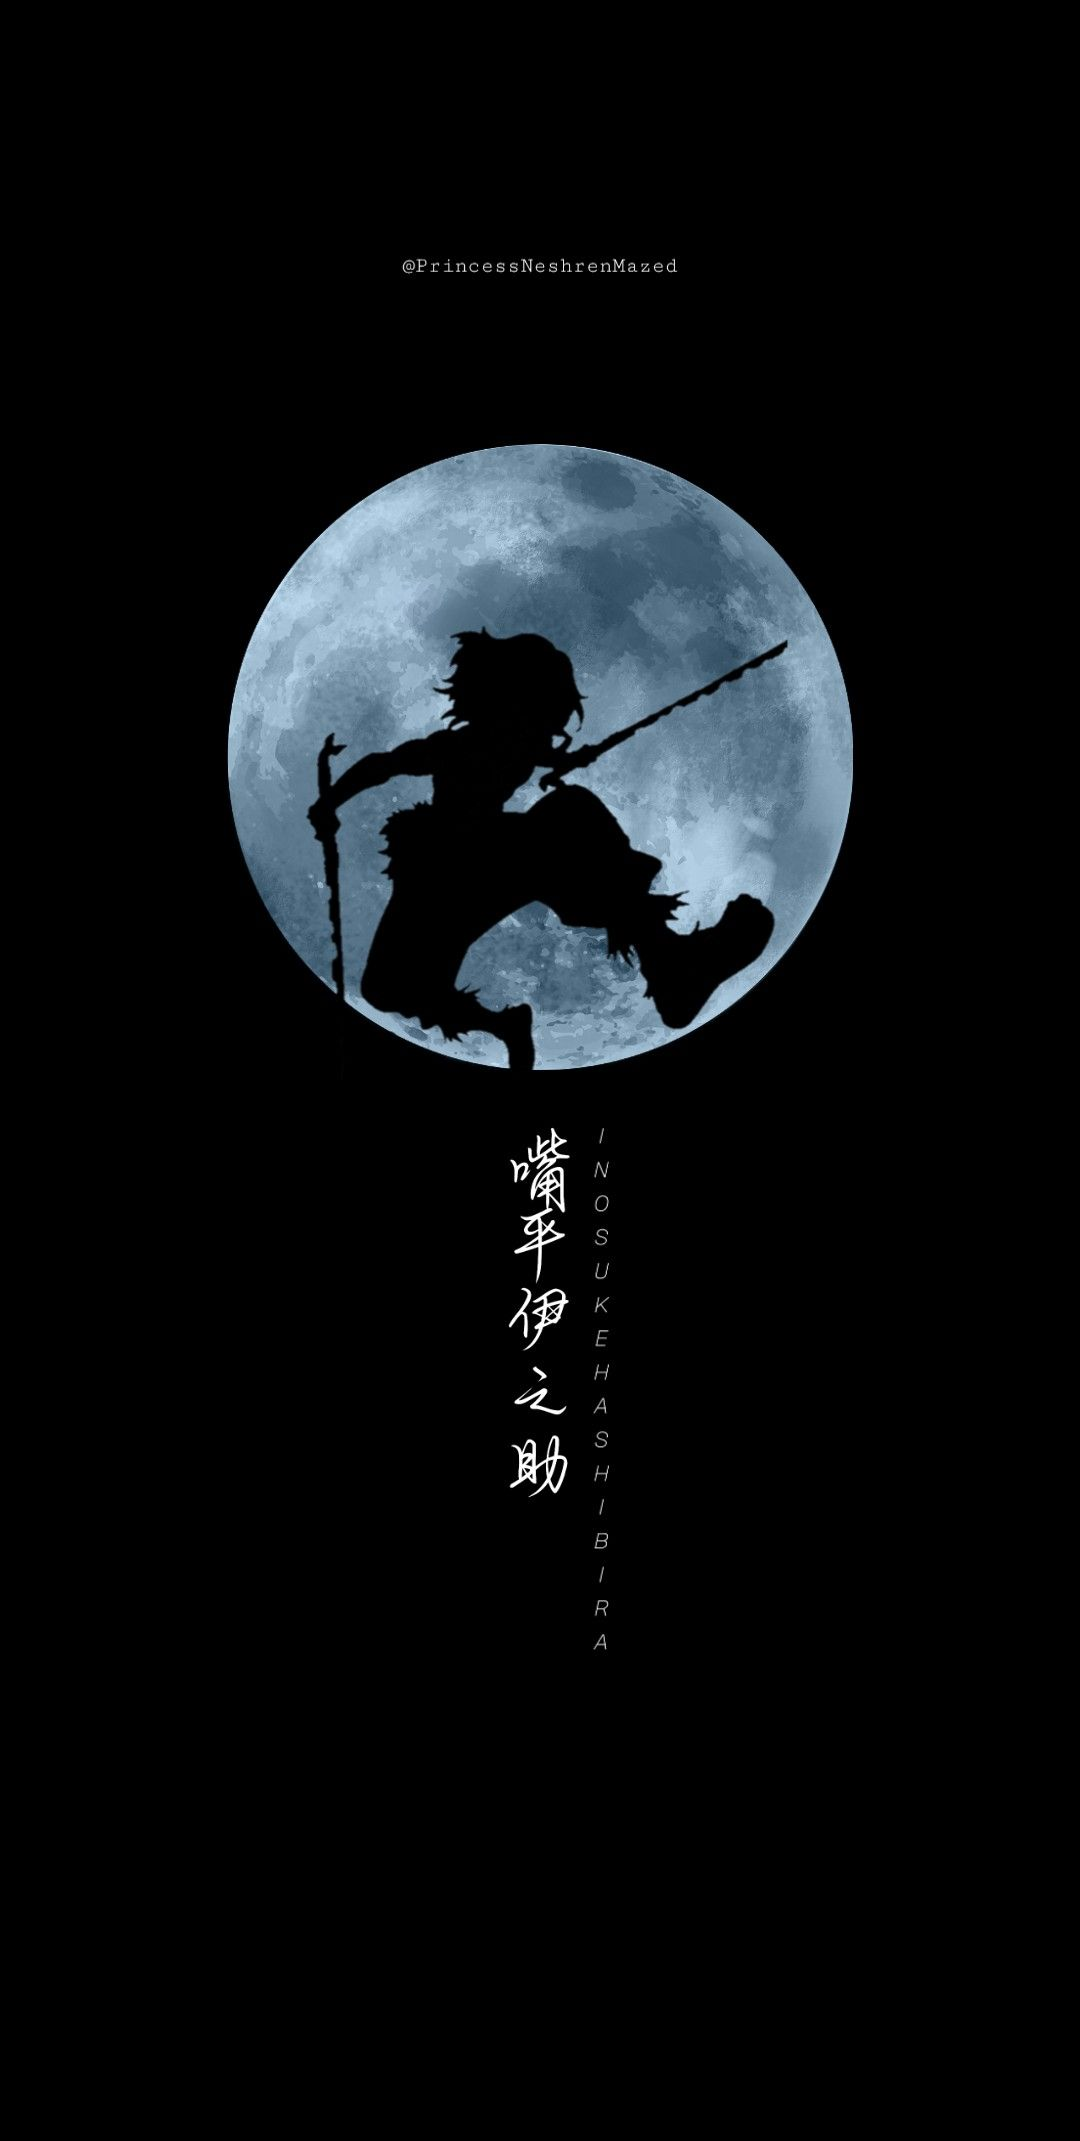 Demon Slayer Inosuke Em 2020 Wallpapers Bonitos Animes Wallpapers Boa Sorte